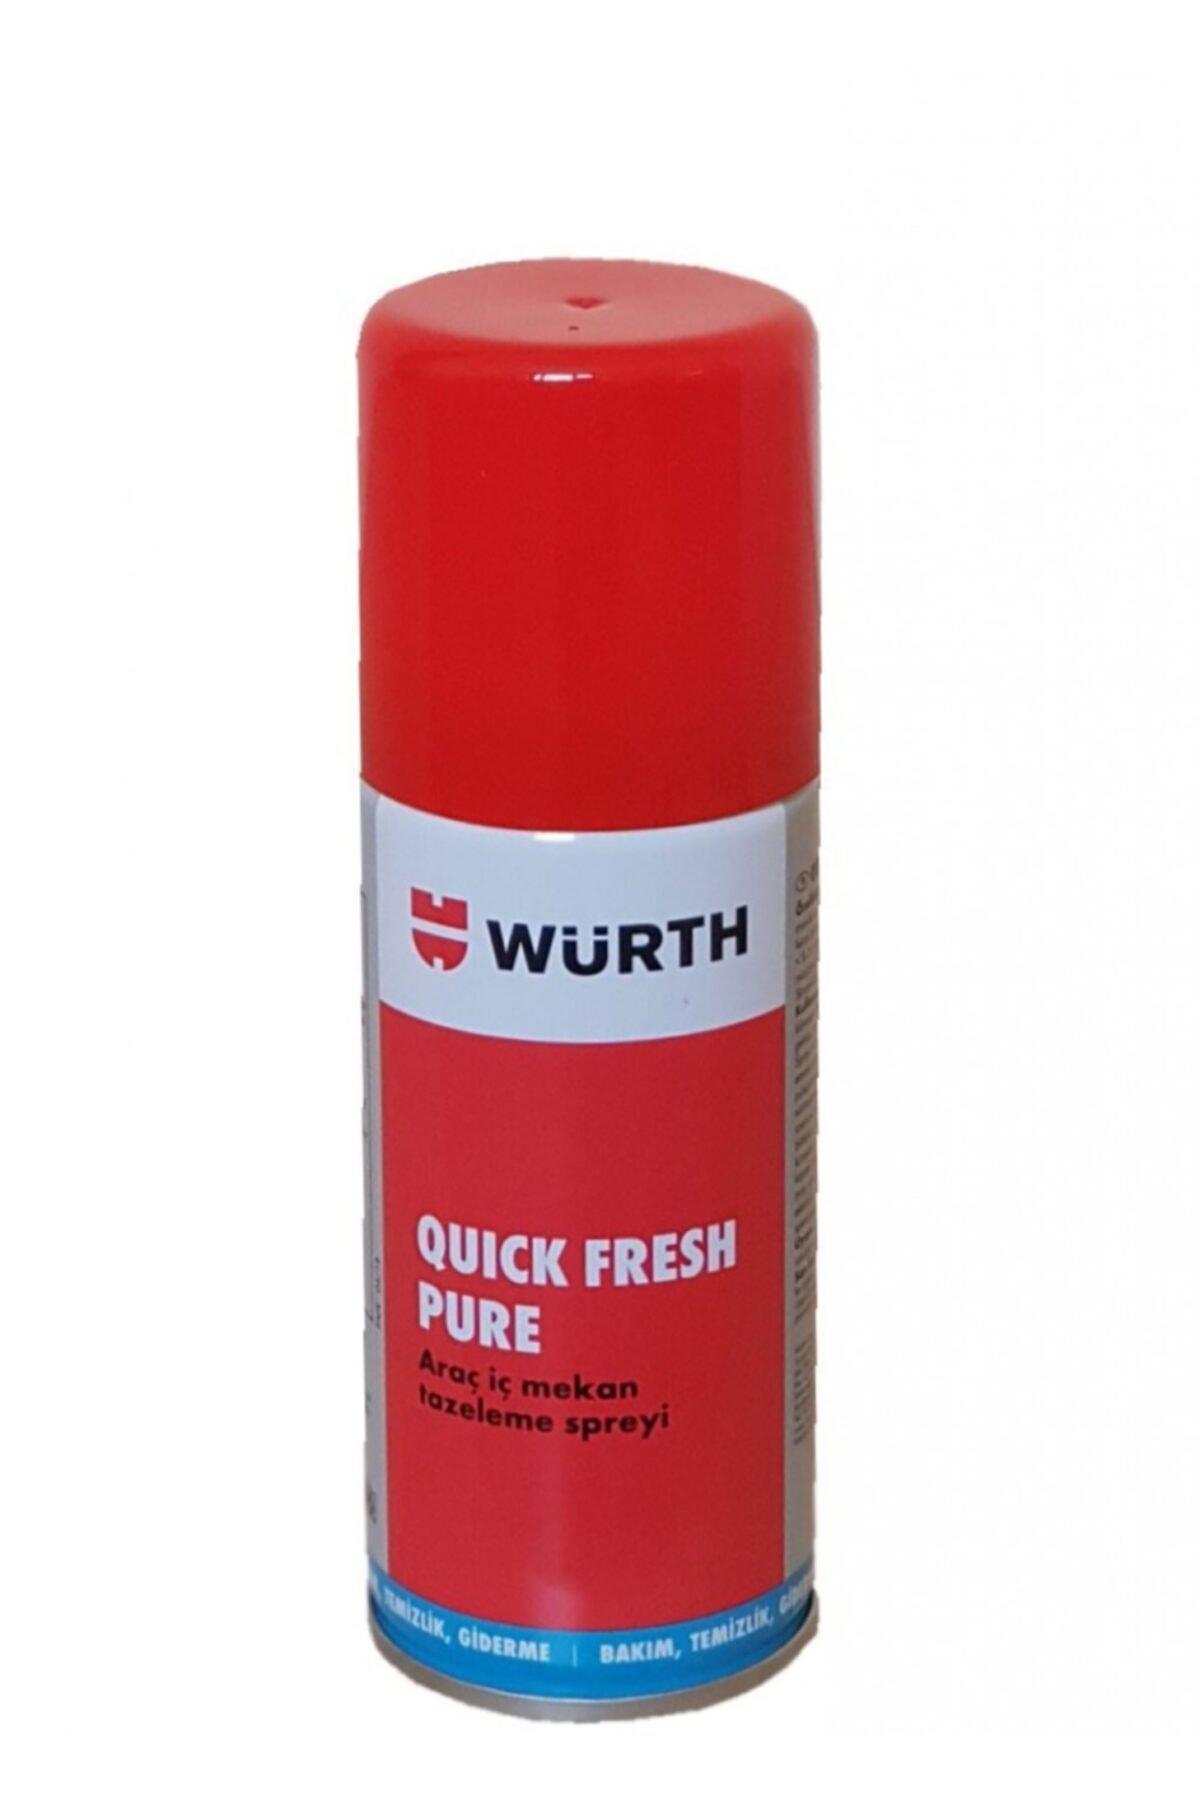 Würth Araç Içi Tazeleme Spreyi Quıck Fresh 100 ml 1